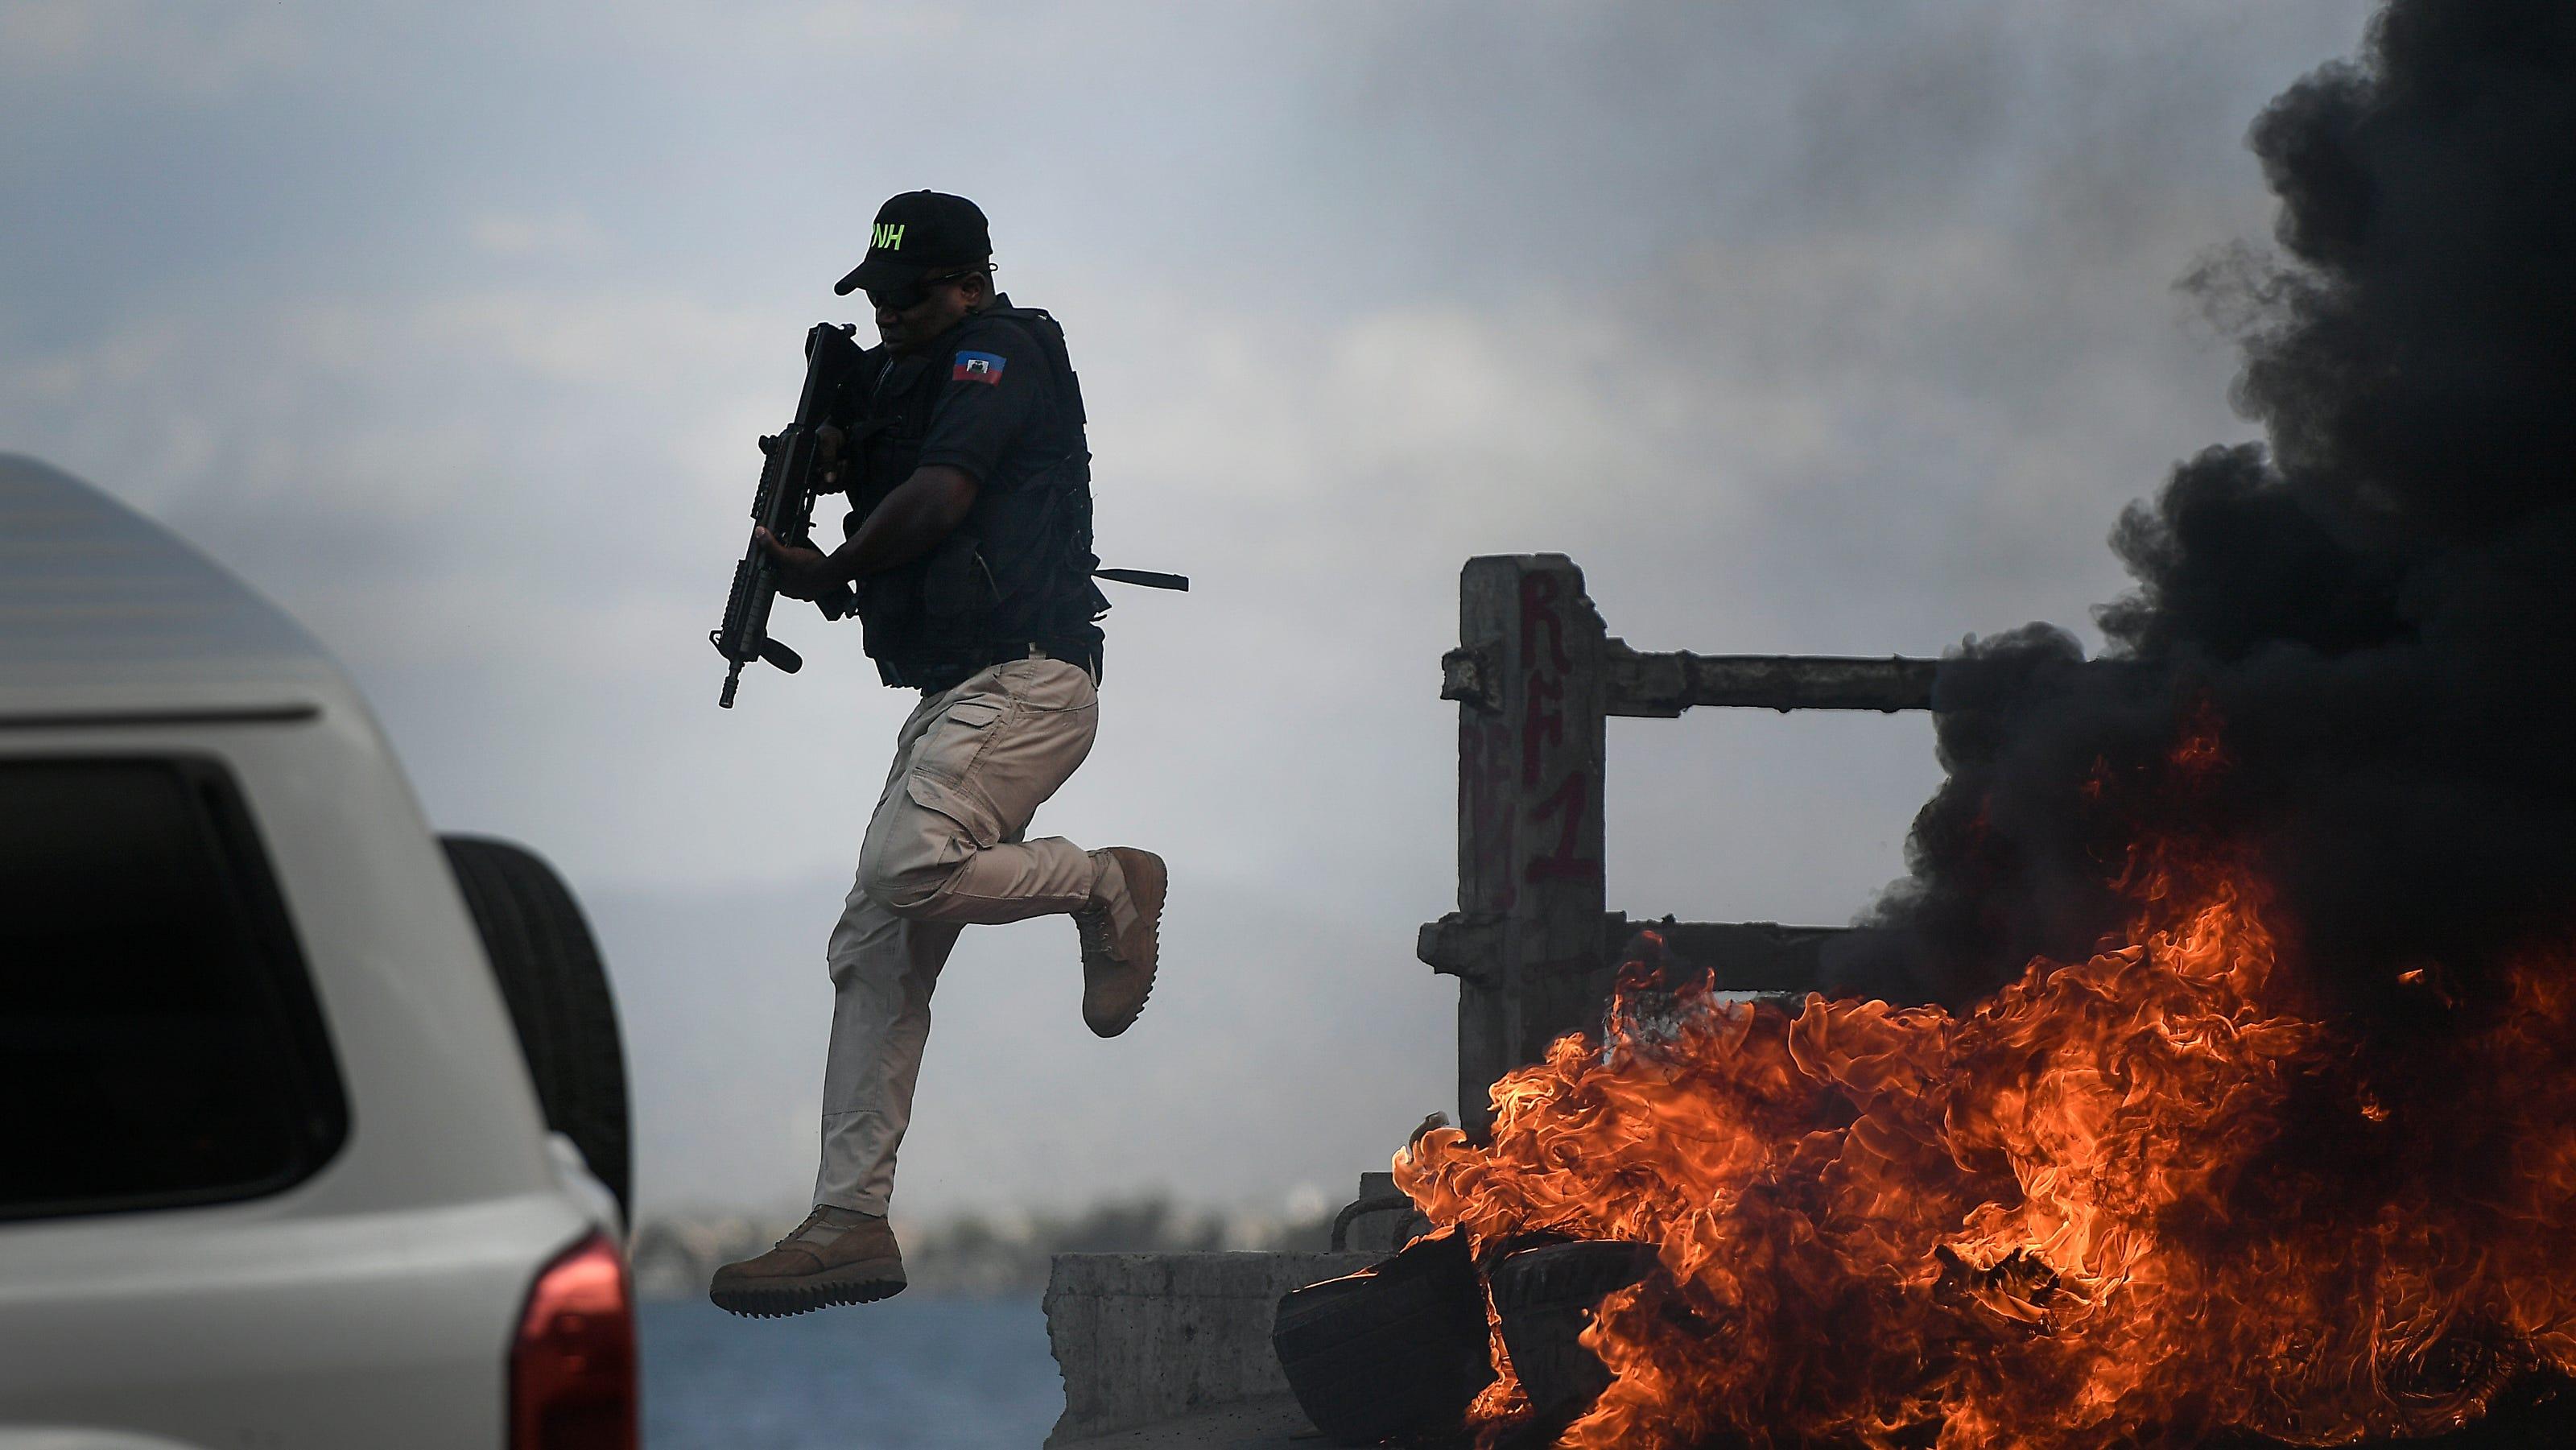 Haiti: Violence overshadows memorial Mass for assassinated ...